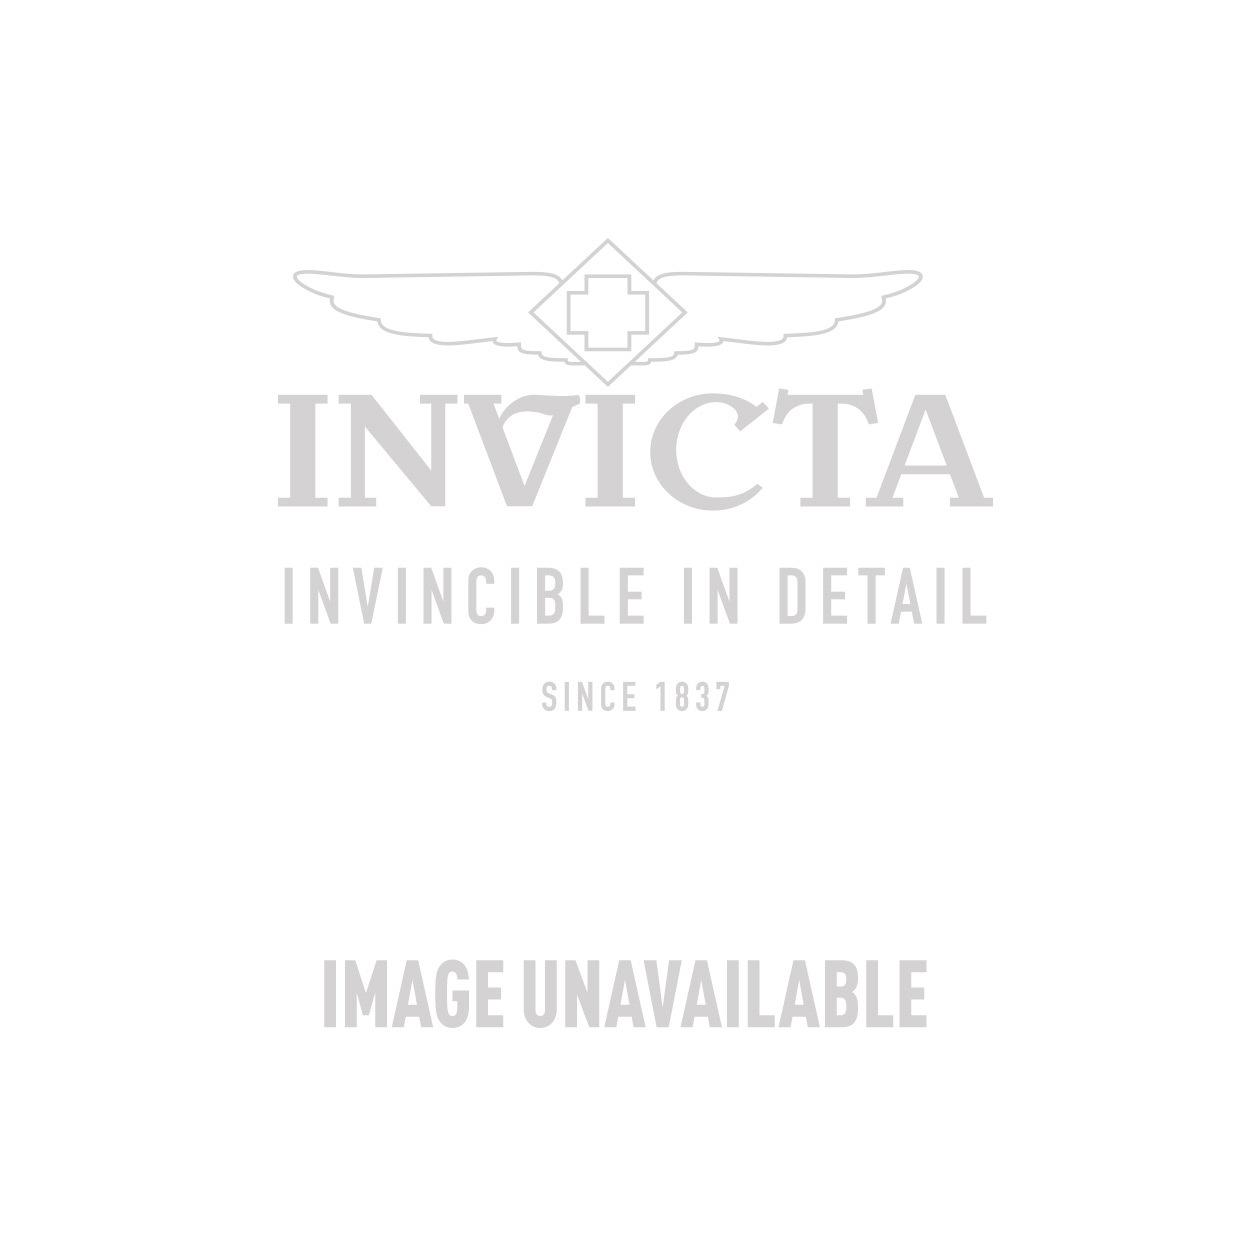 Invicta I-Force Swiss Movement Quartz Watch - Gunmetal case with Black tone Leather band - Model 13009